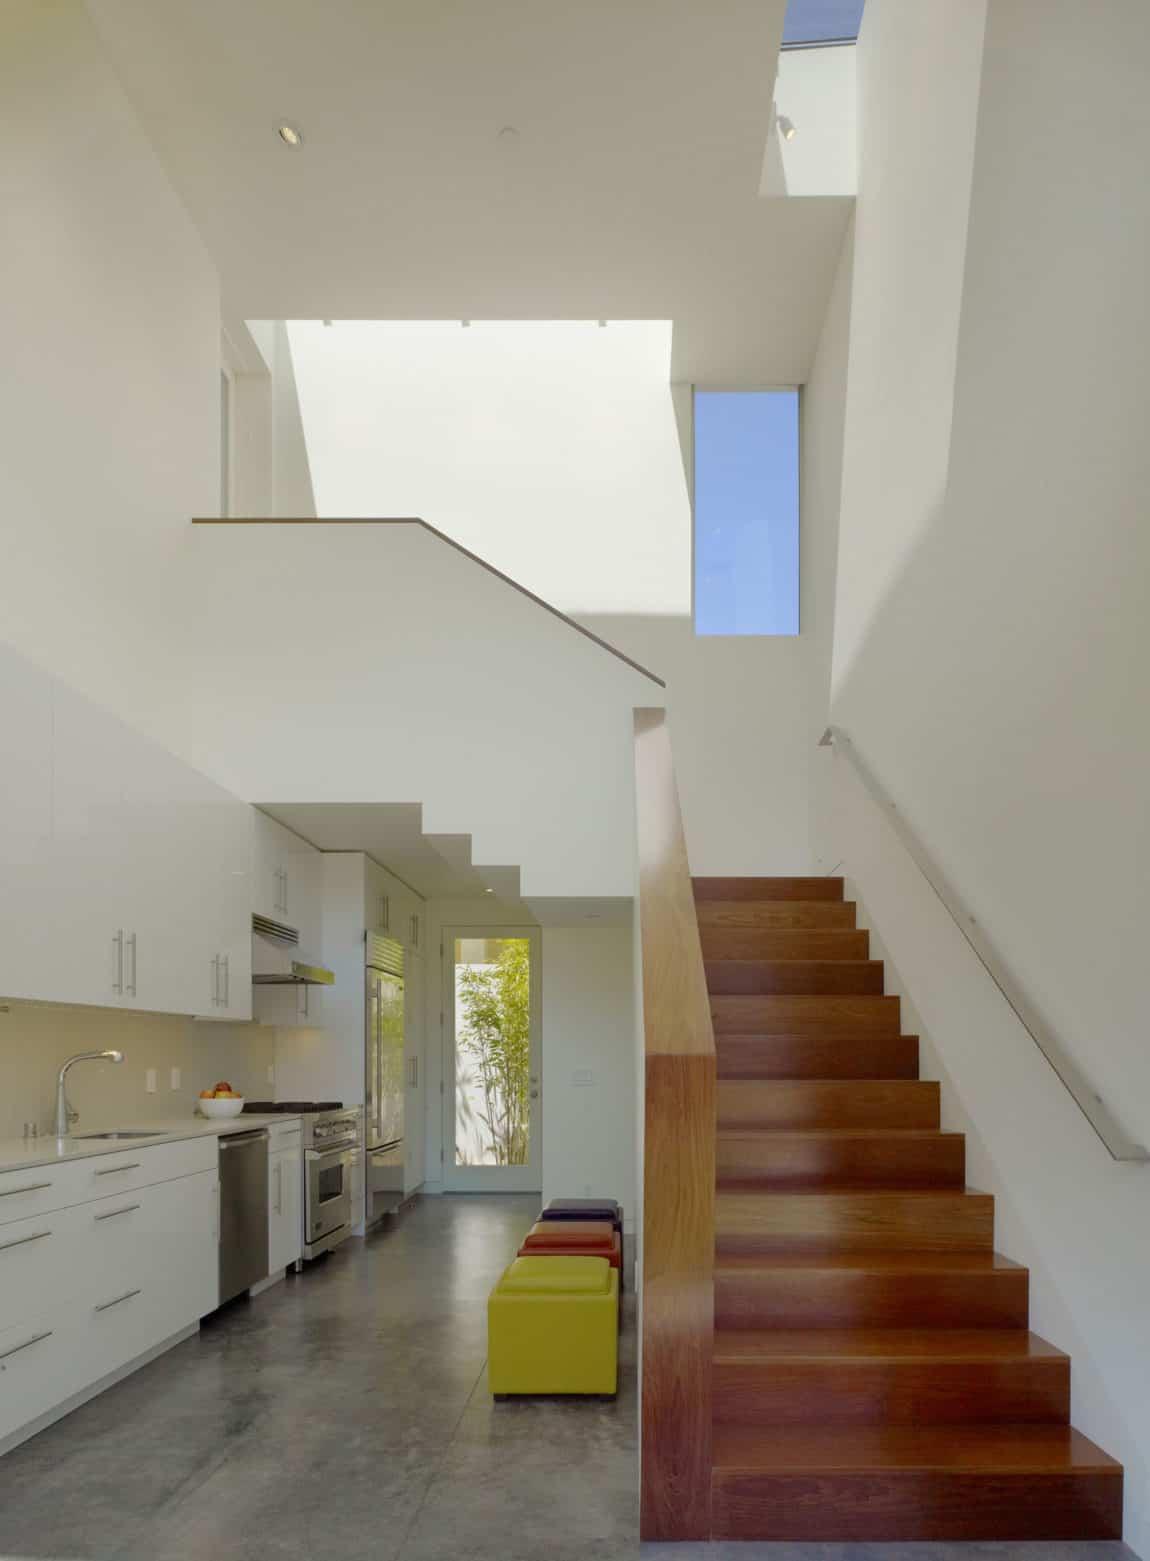 Ehrlich Retreat + by John Friedman Alice Kimm Architects (13)